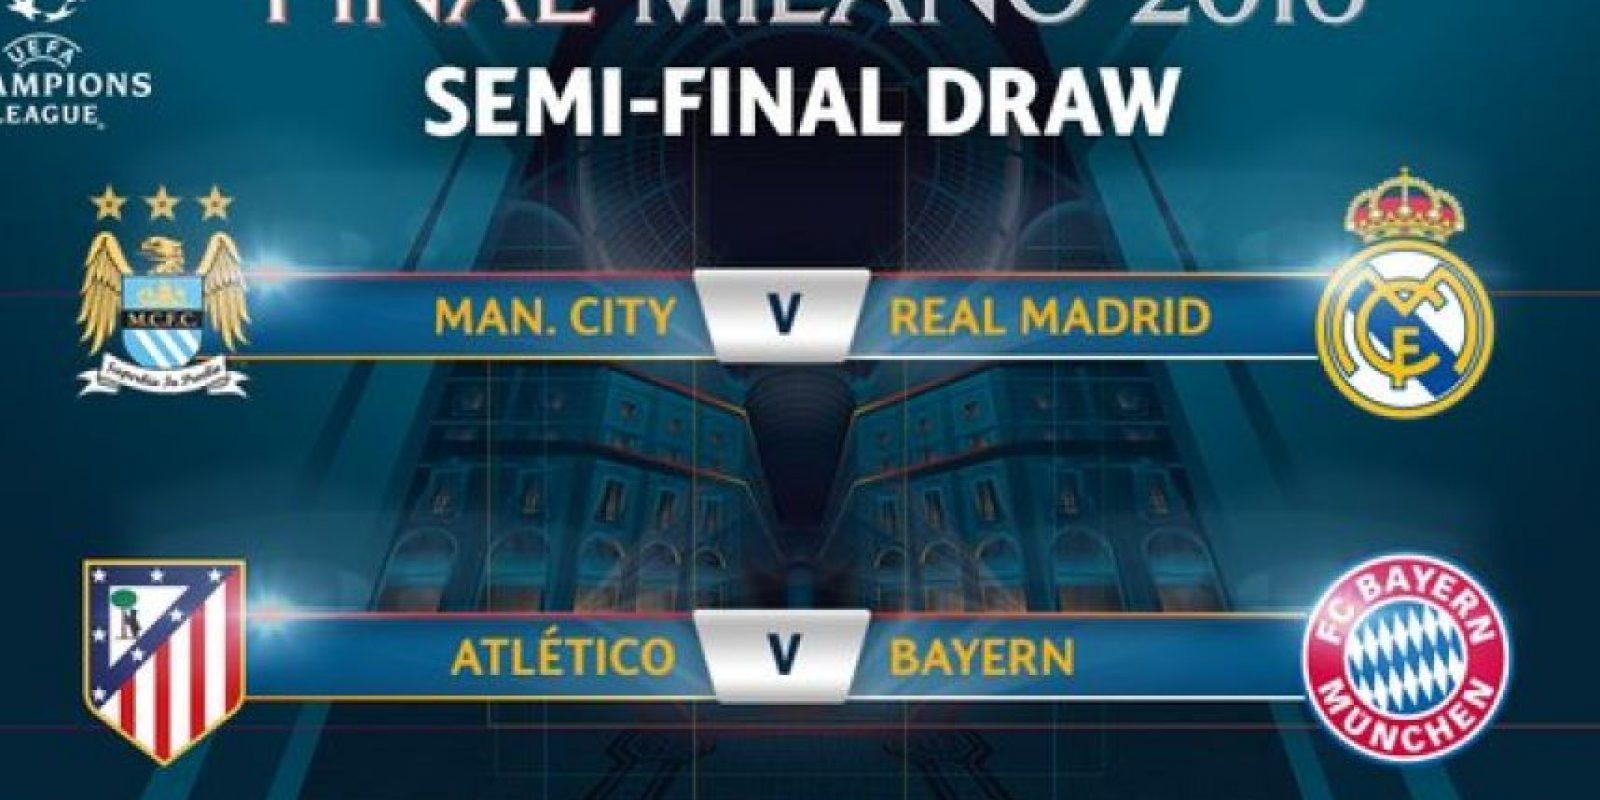 Así serán las semifinales de la Champions League Foto:twitter.com/ChampionsLeague/